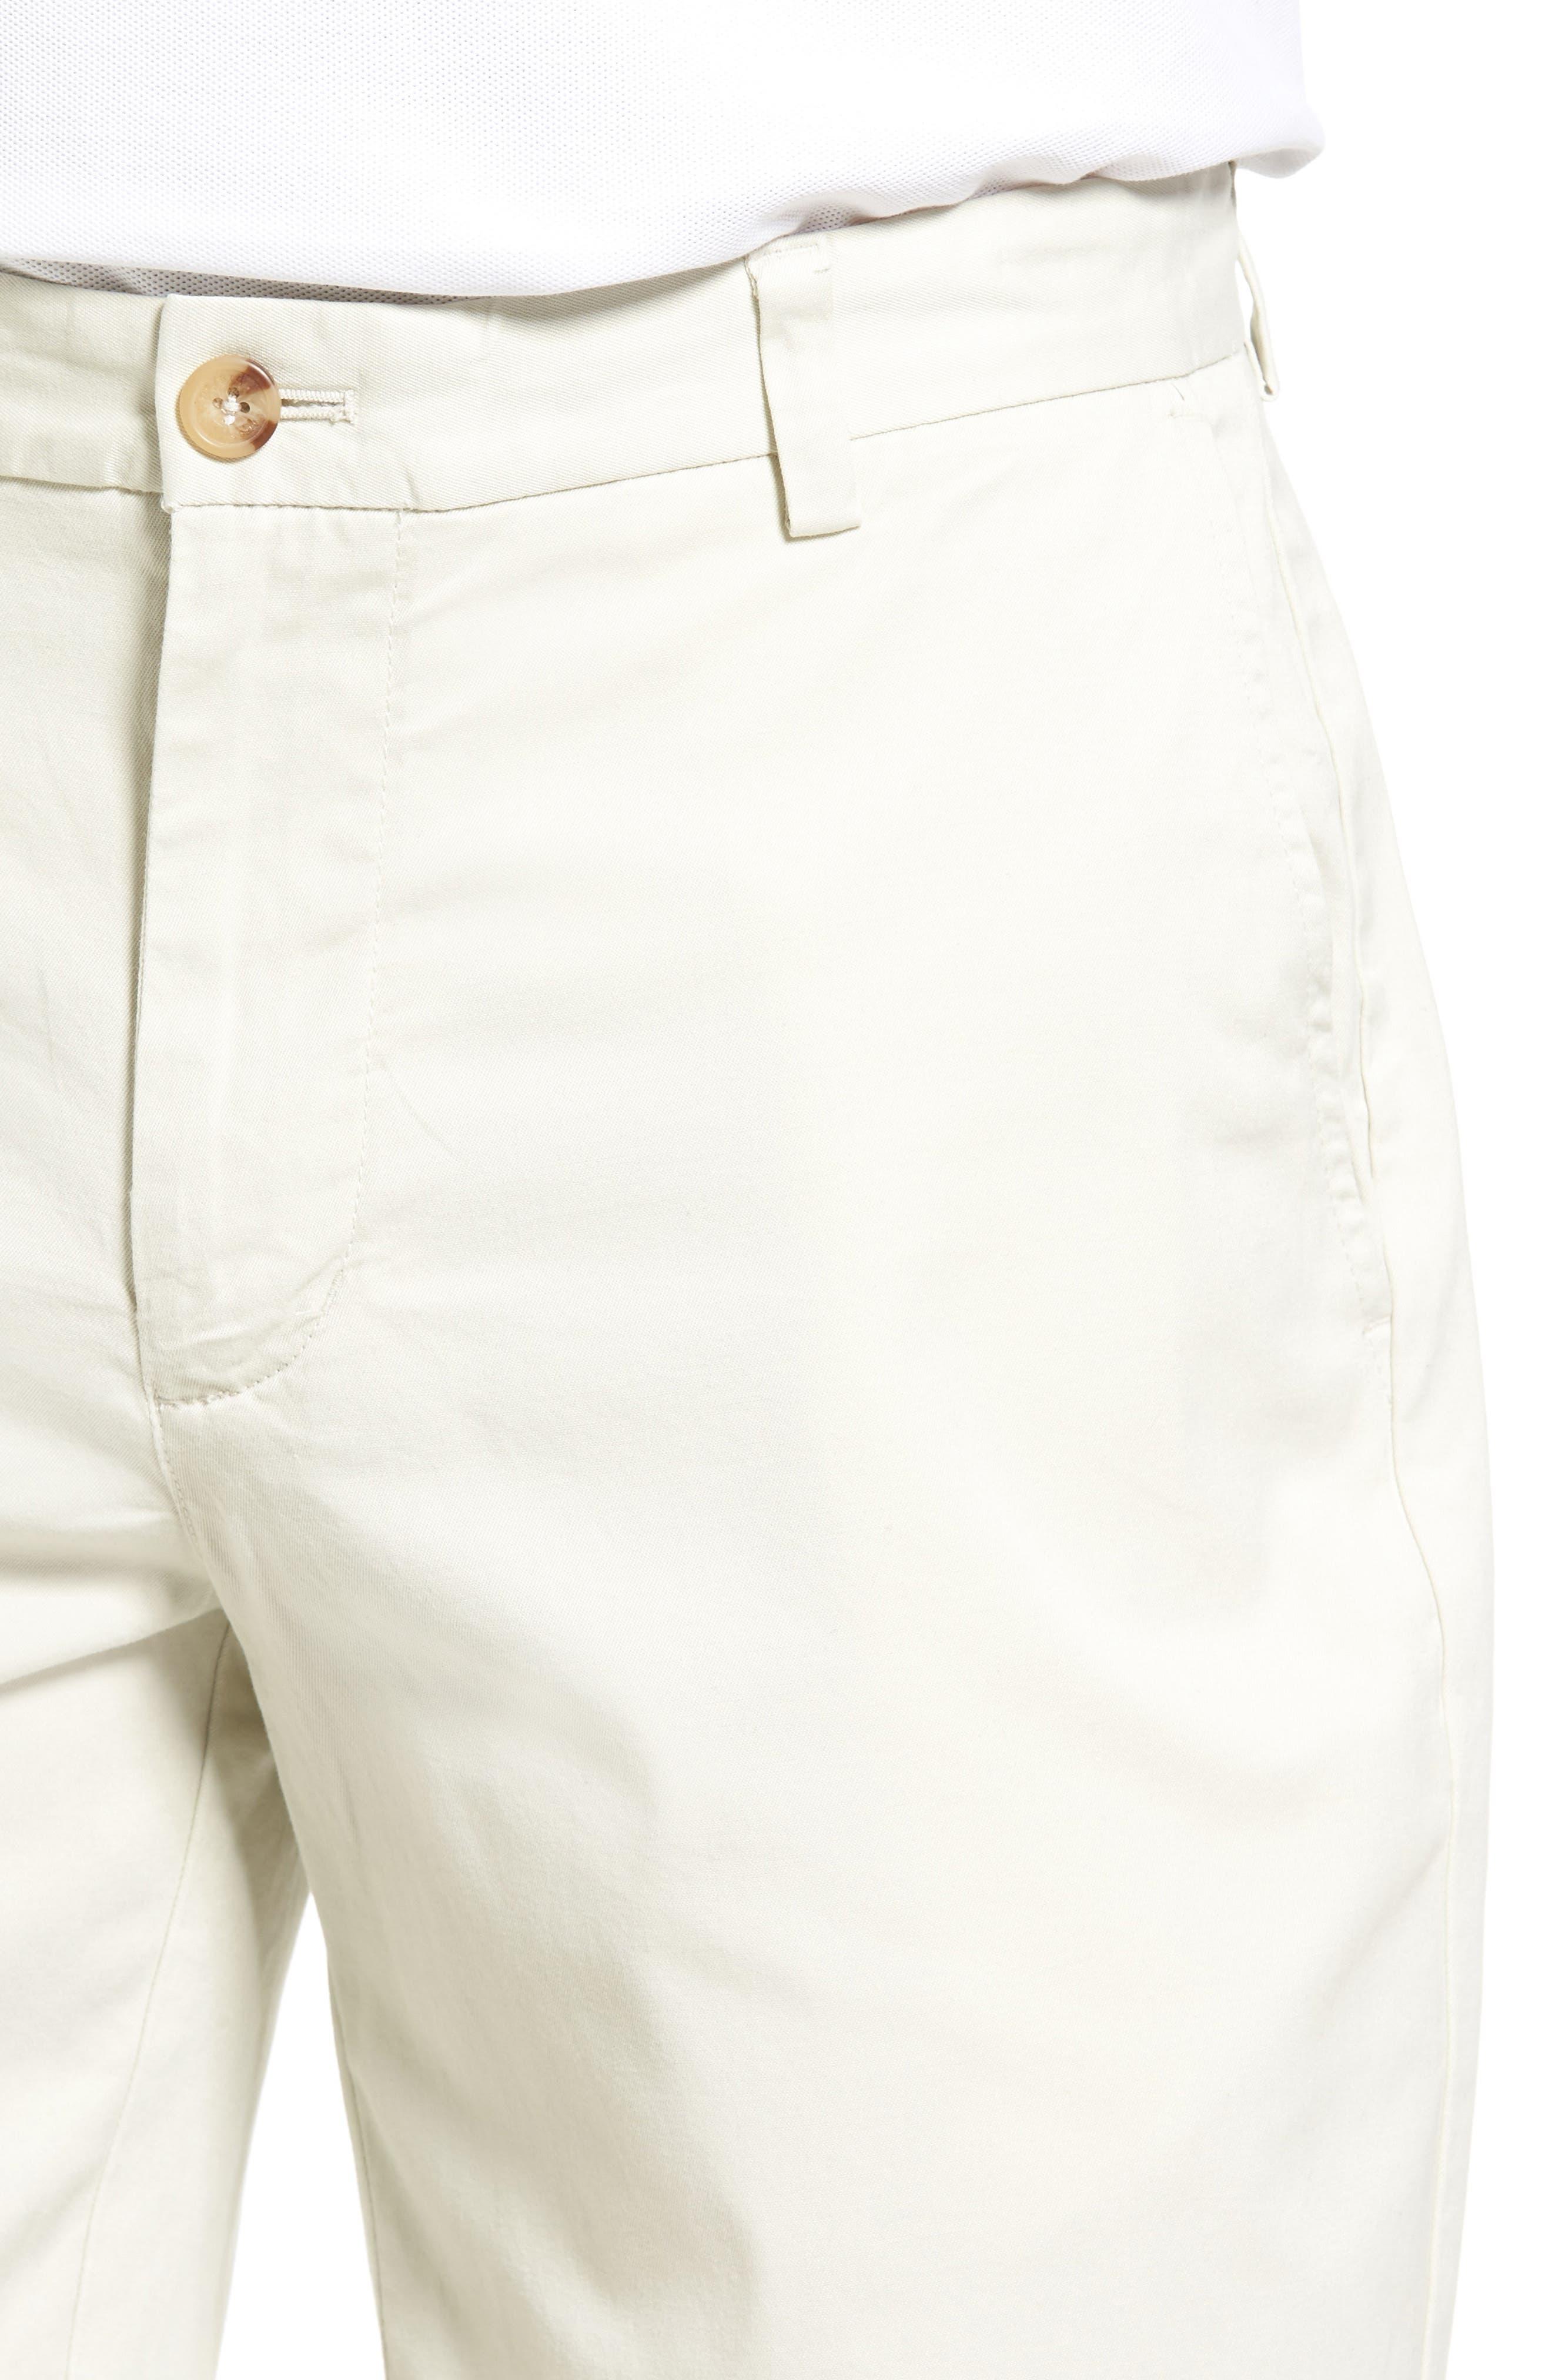 9 Inch Stretch Breaker Shorts,                             Alternate thumbnail 81, color,